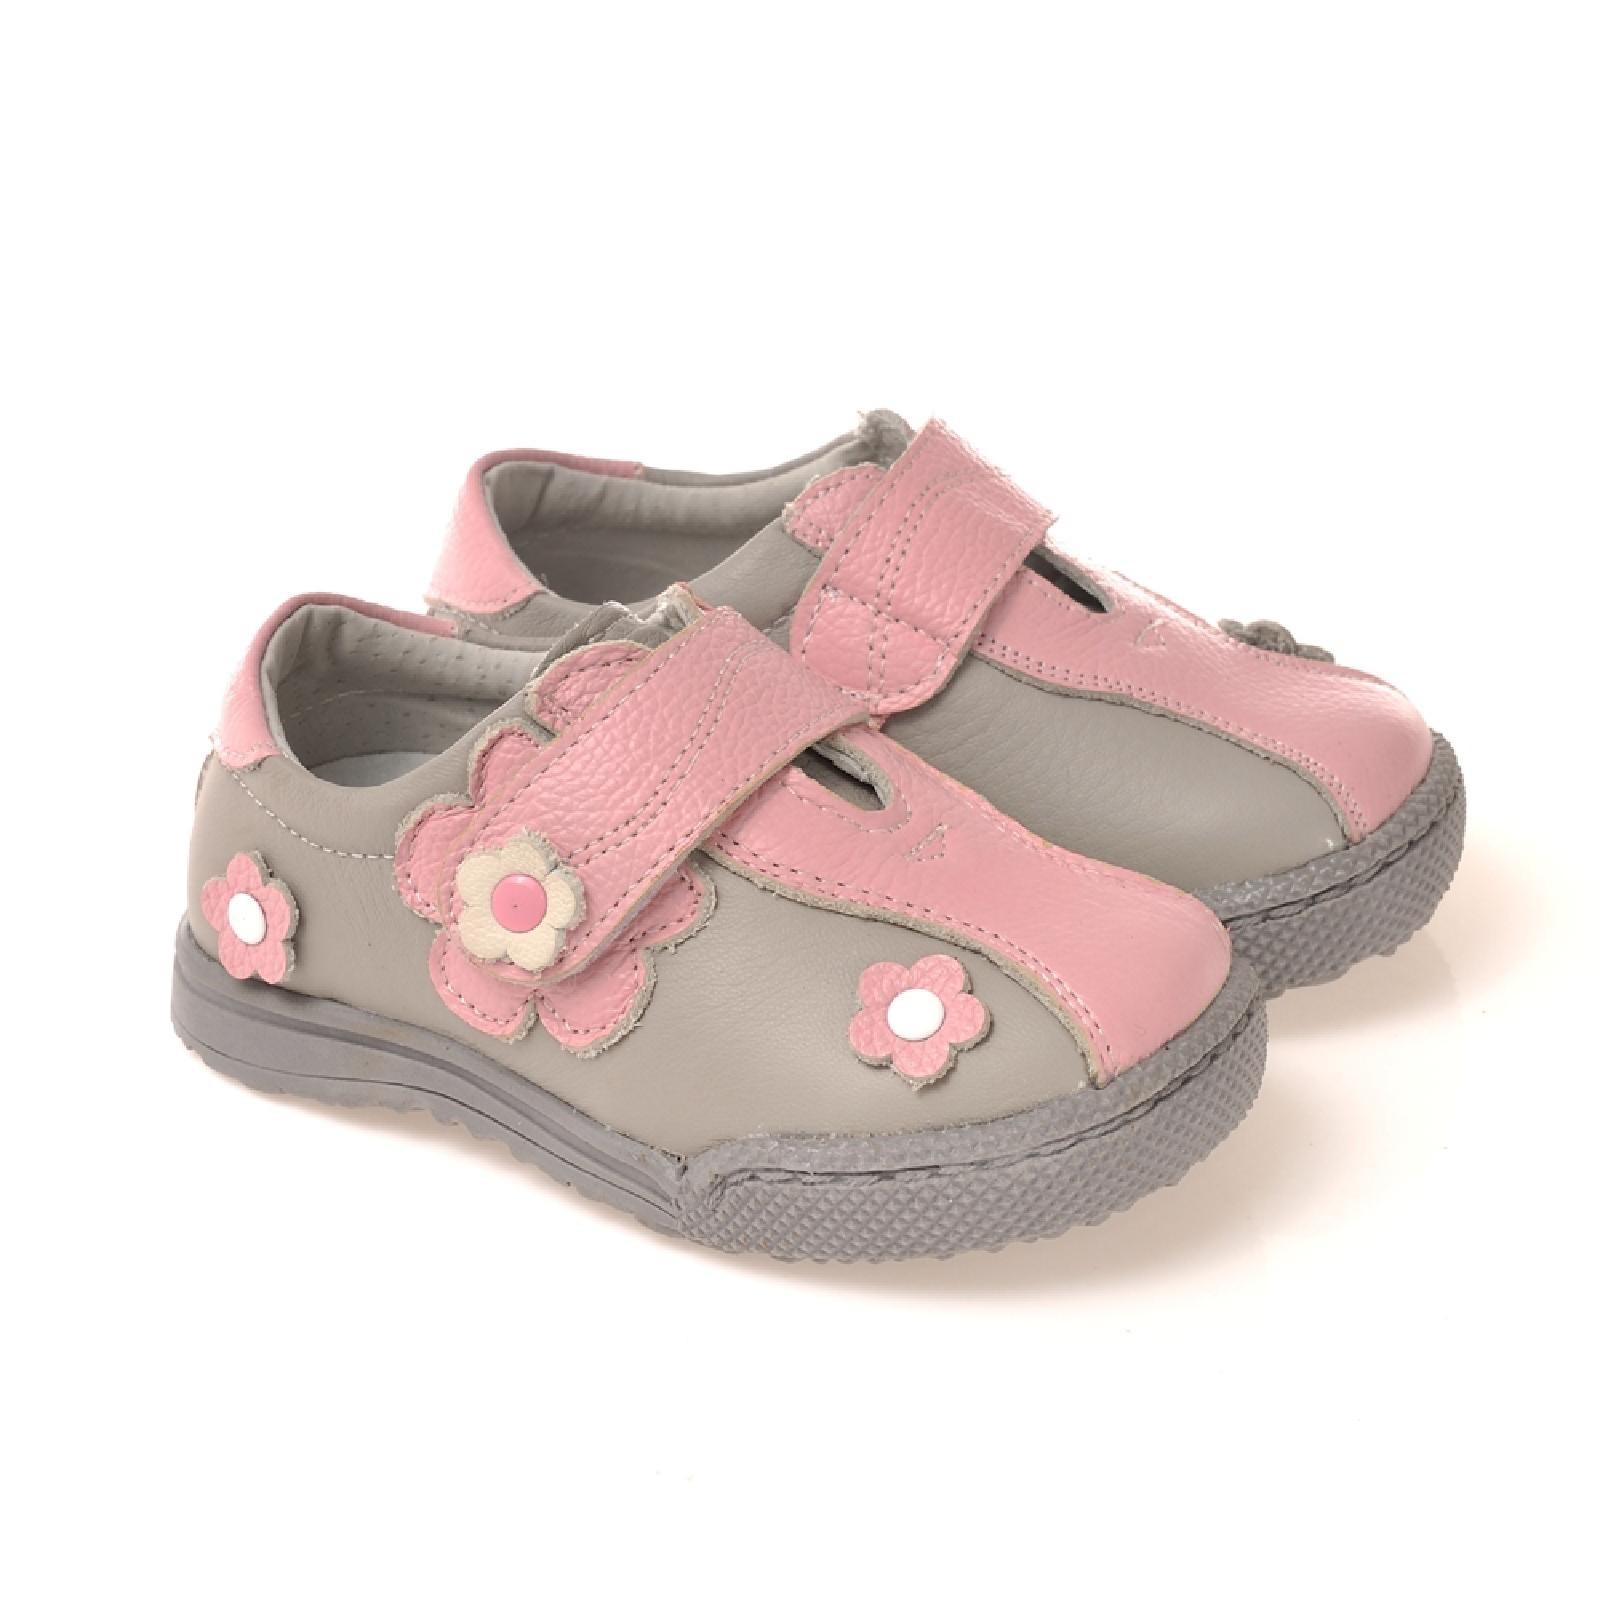 8dd0a939fed87b Caroch Mädchen Sneaker Kinderschuhe aus Leder in rosa hellgrau -  Lauflernschuhe Halbschuhe